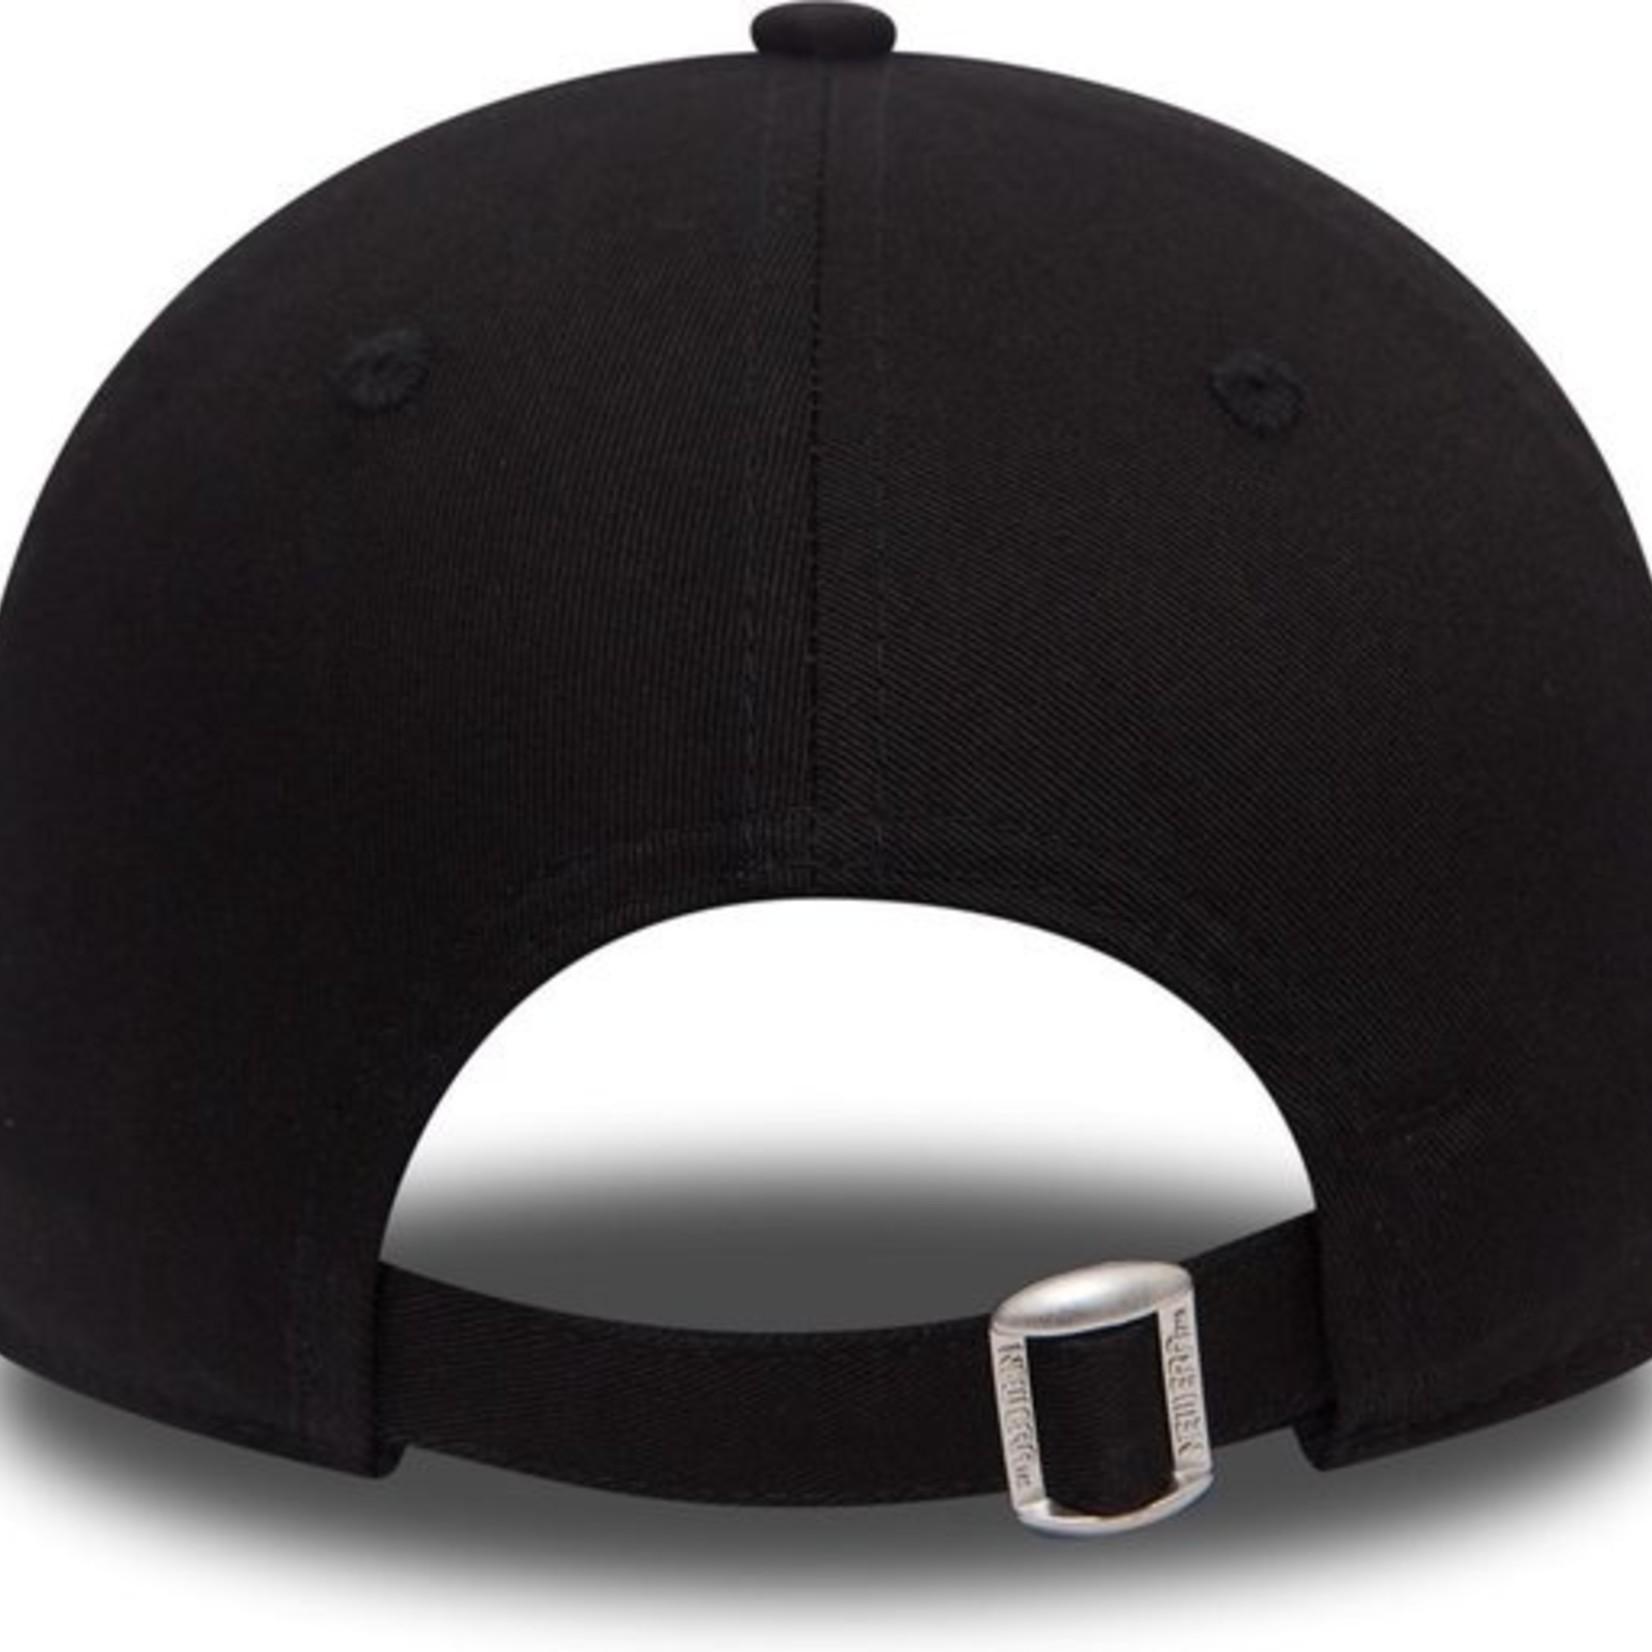 New Era NY 9Forty Black/Black adjustable